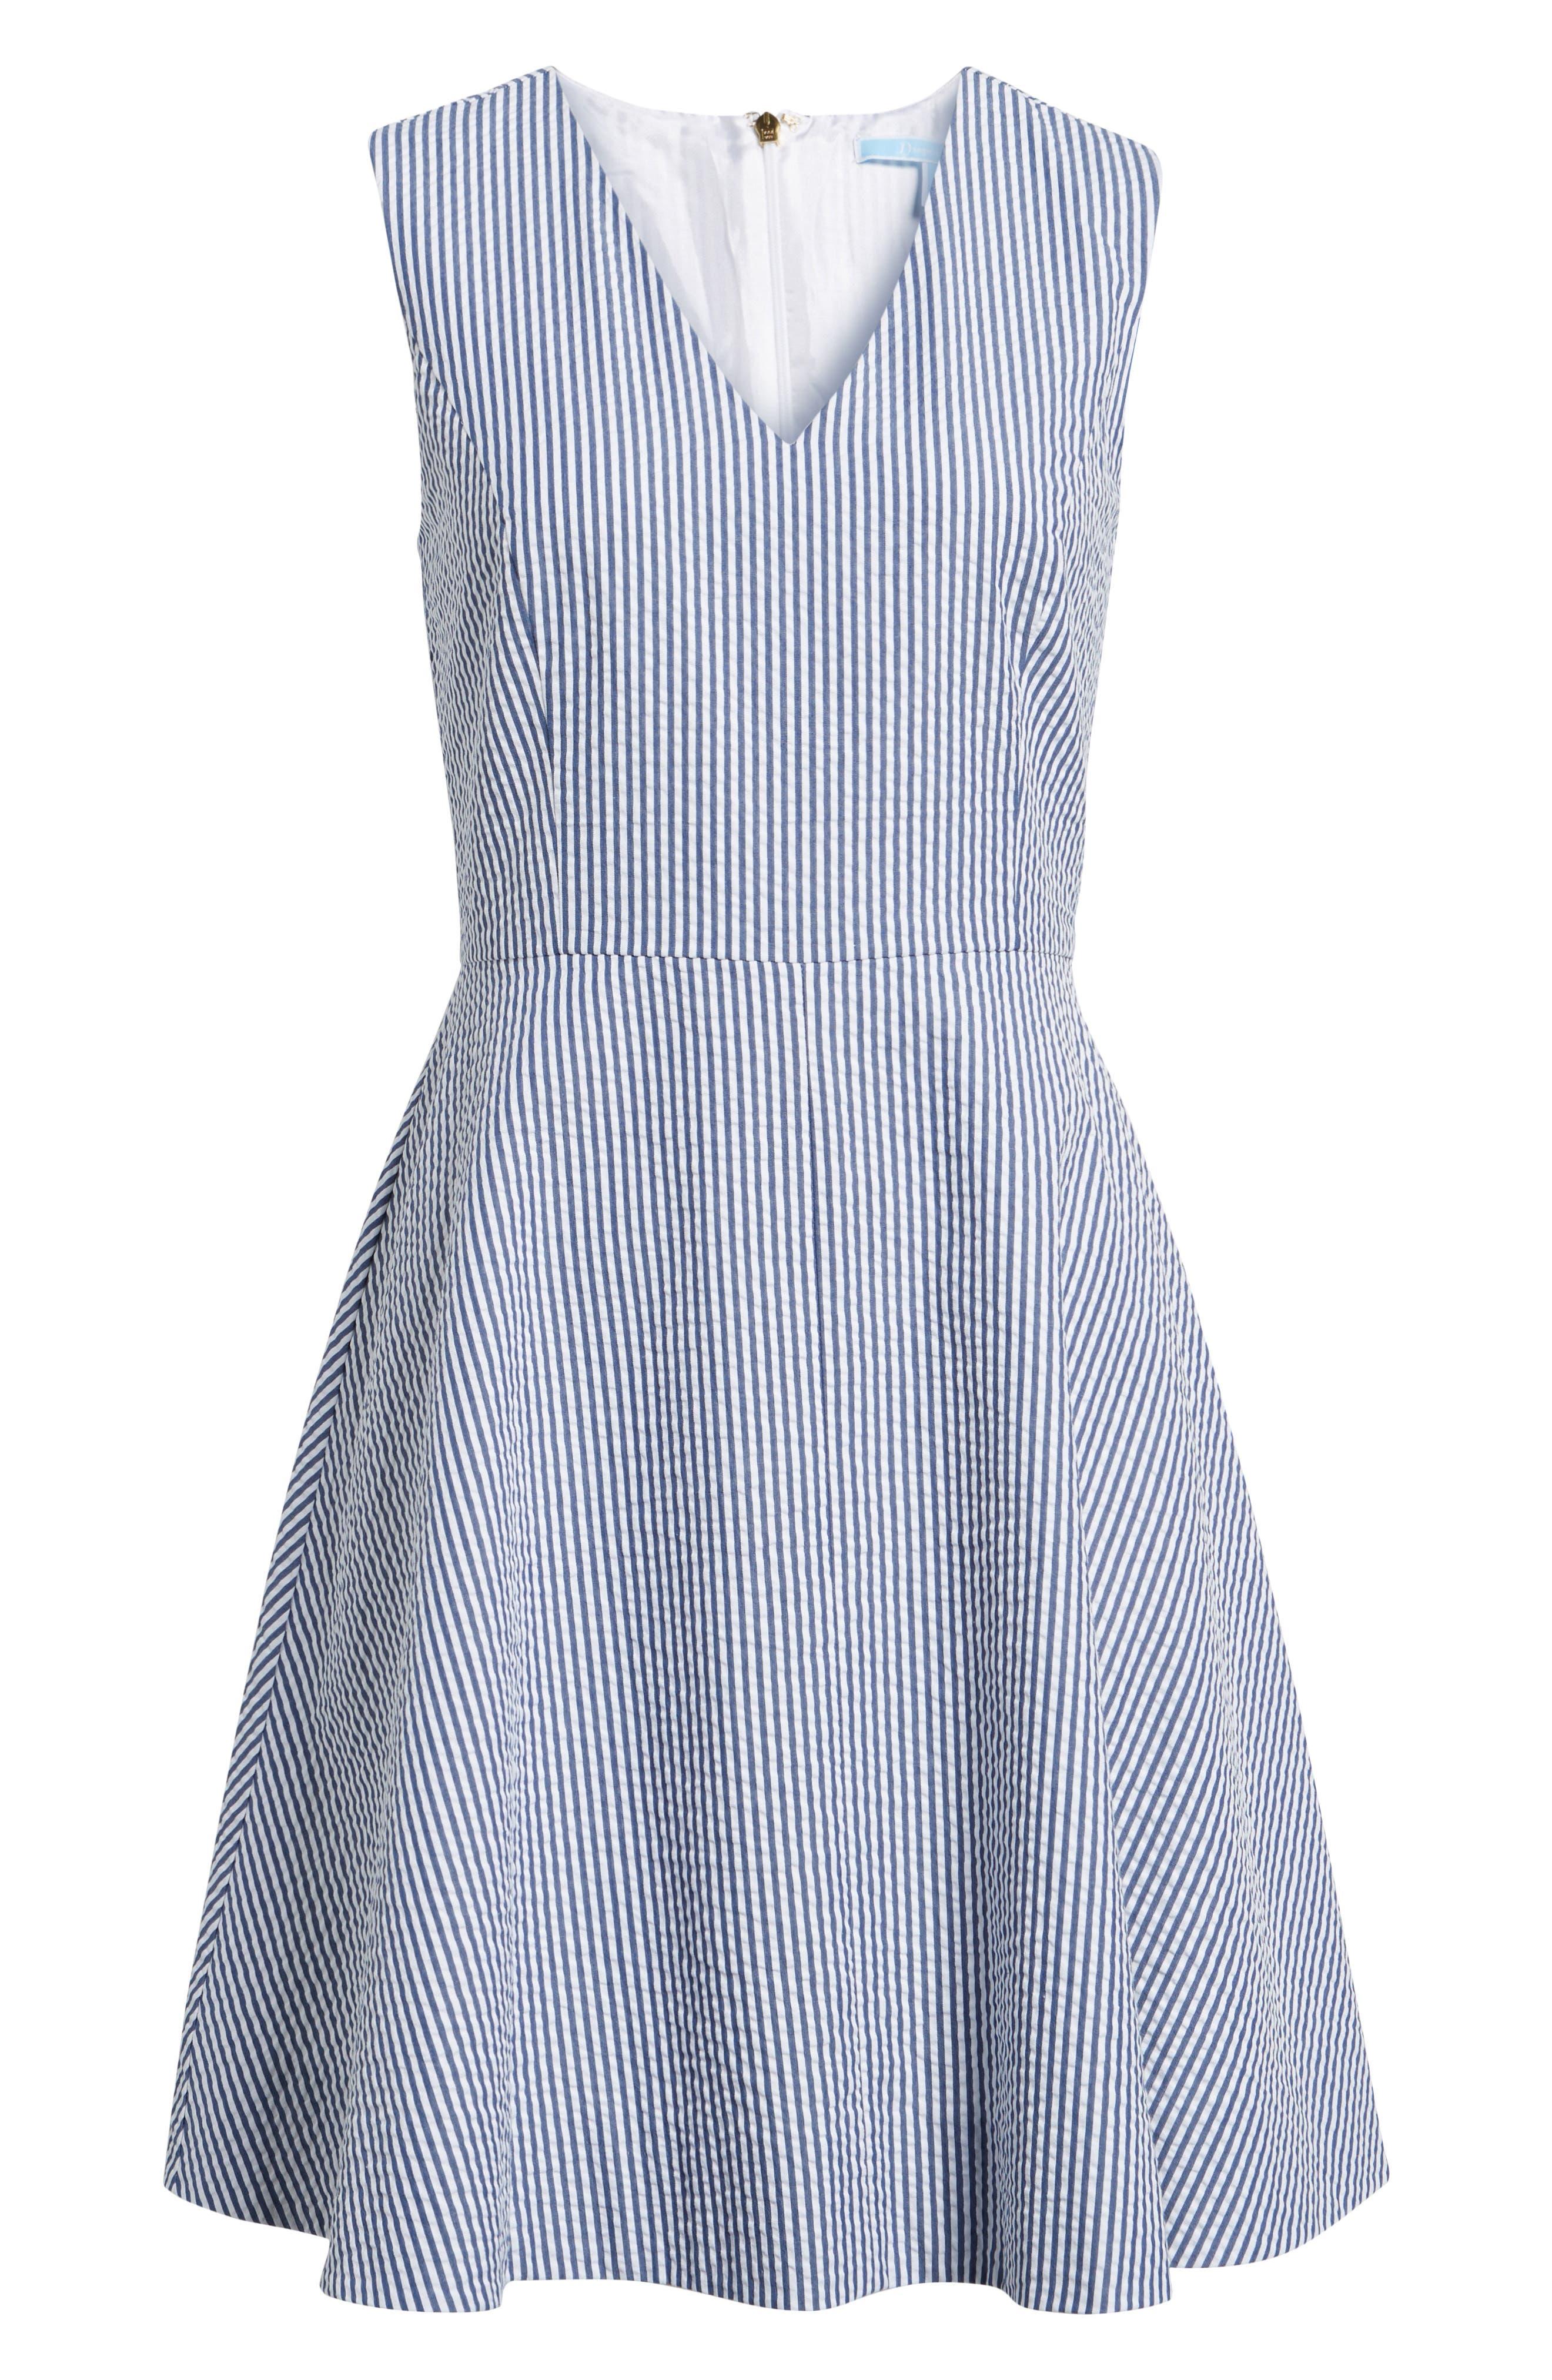 Love Circle Seersucker Stretch Cotton Dress,                             Alternate thumbnail 6, color,                             Navy